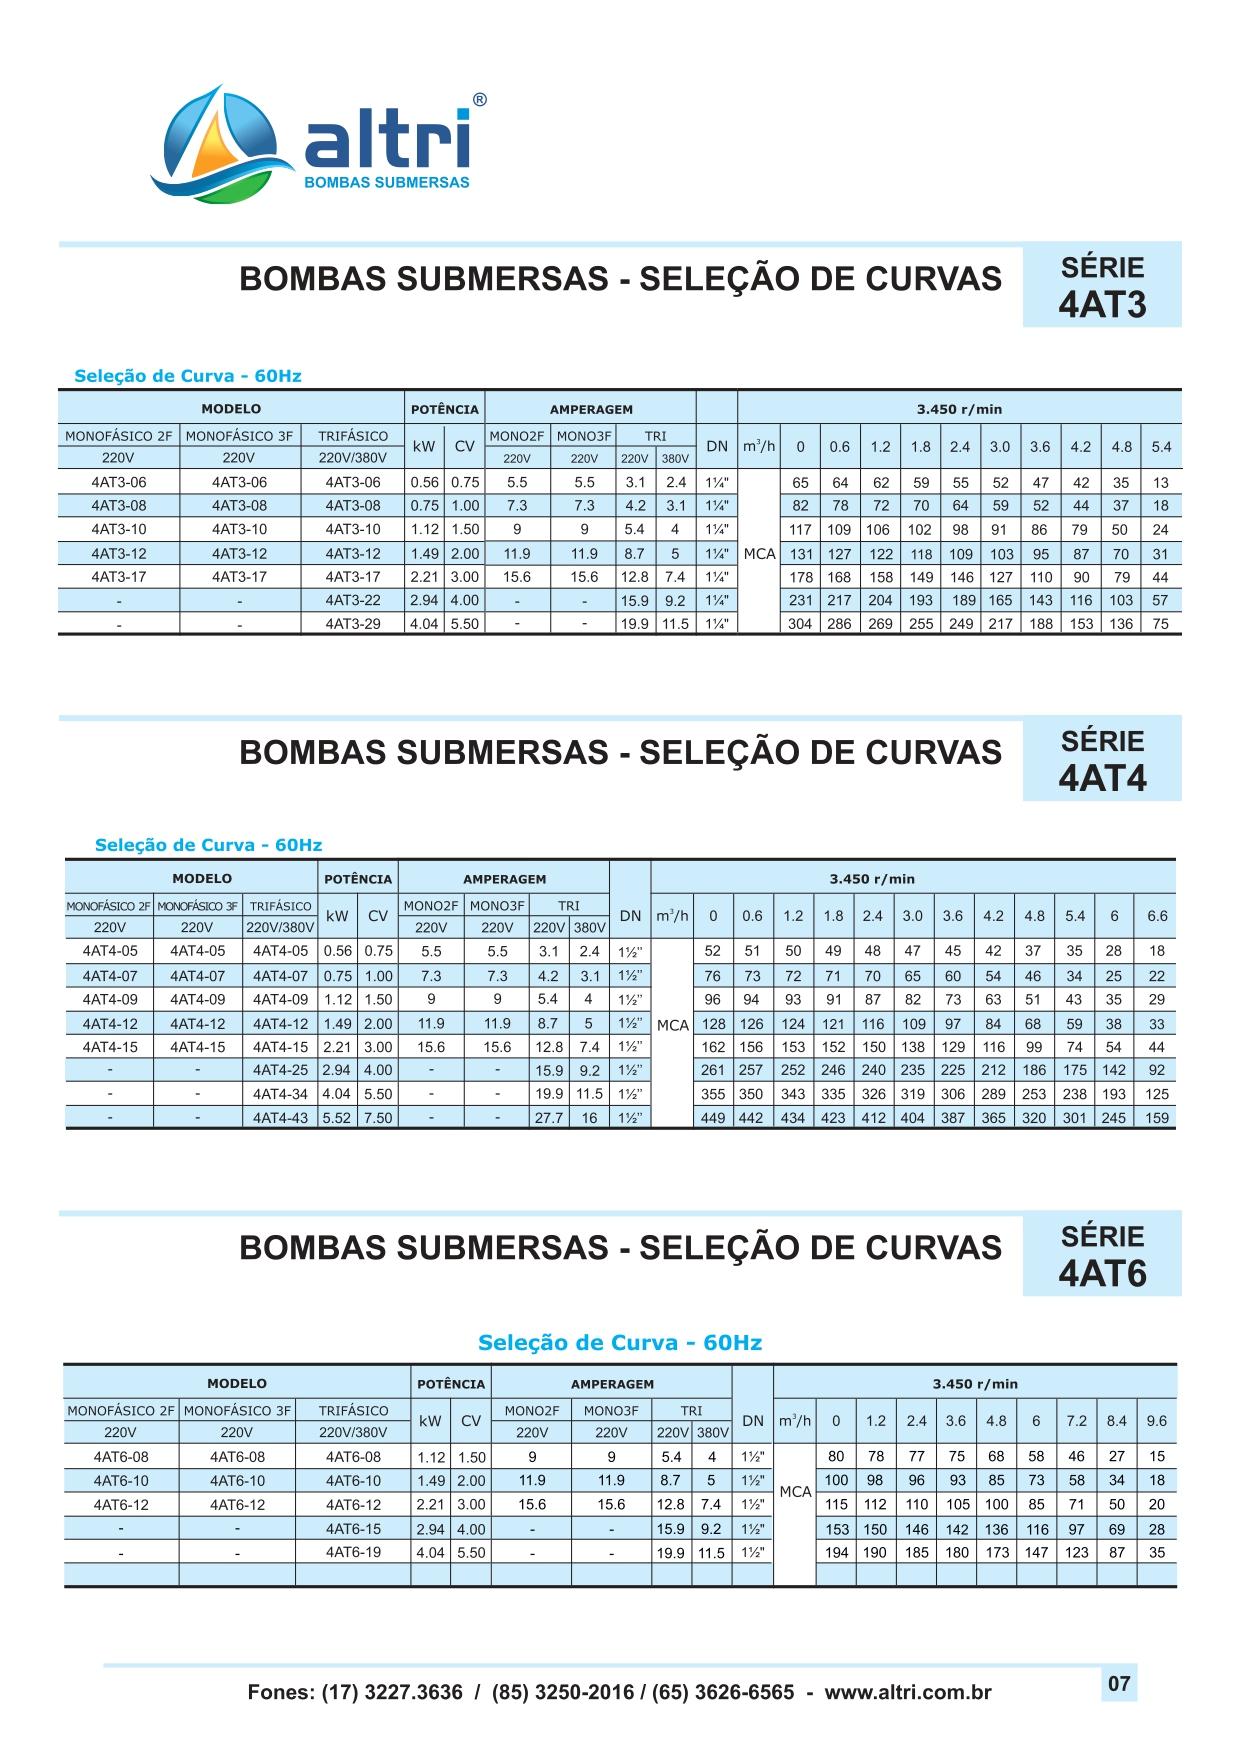 CATALOGO DE PRODUTOS ALTRI 2021 - WEB_page-0009